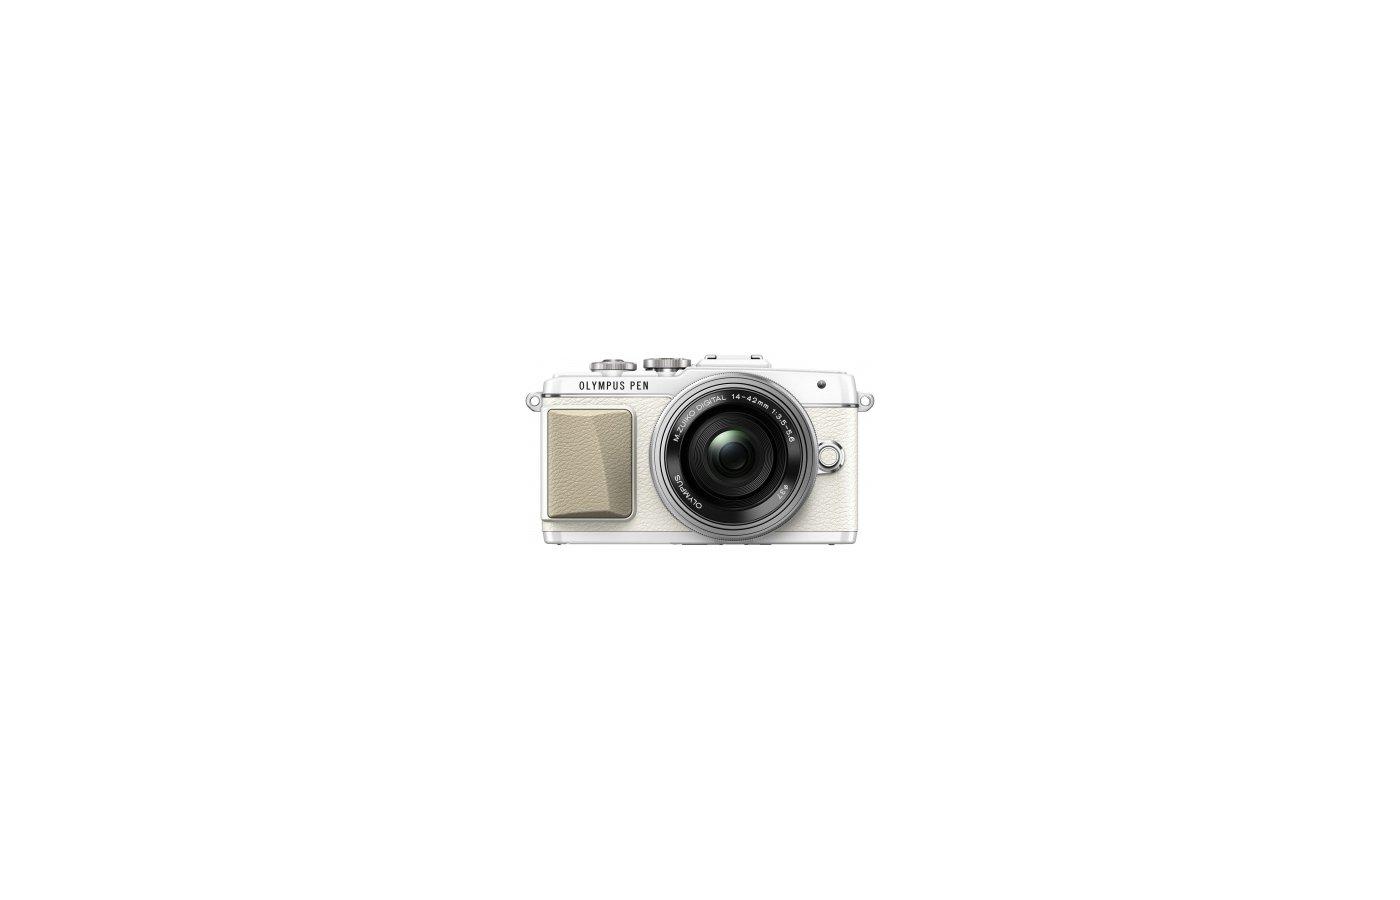 Фотоаппарат со сменной оптикой OLYMPUS PEN E-PL7 Kit ( E-PL7 Body white + EZ-M1442EZ silver )